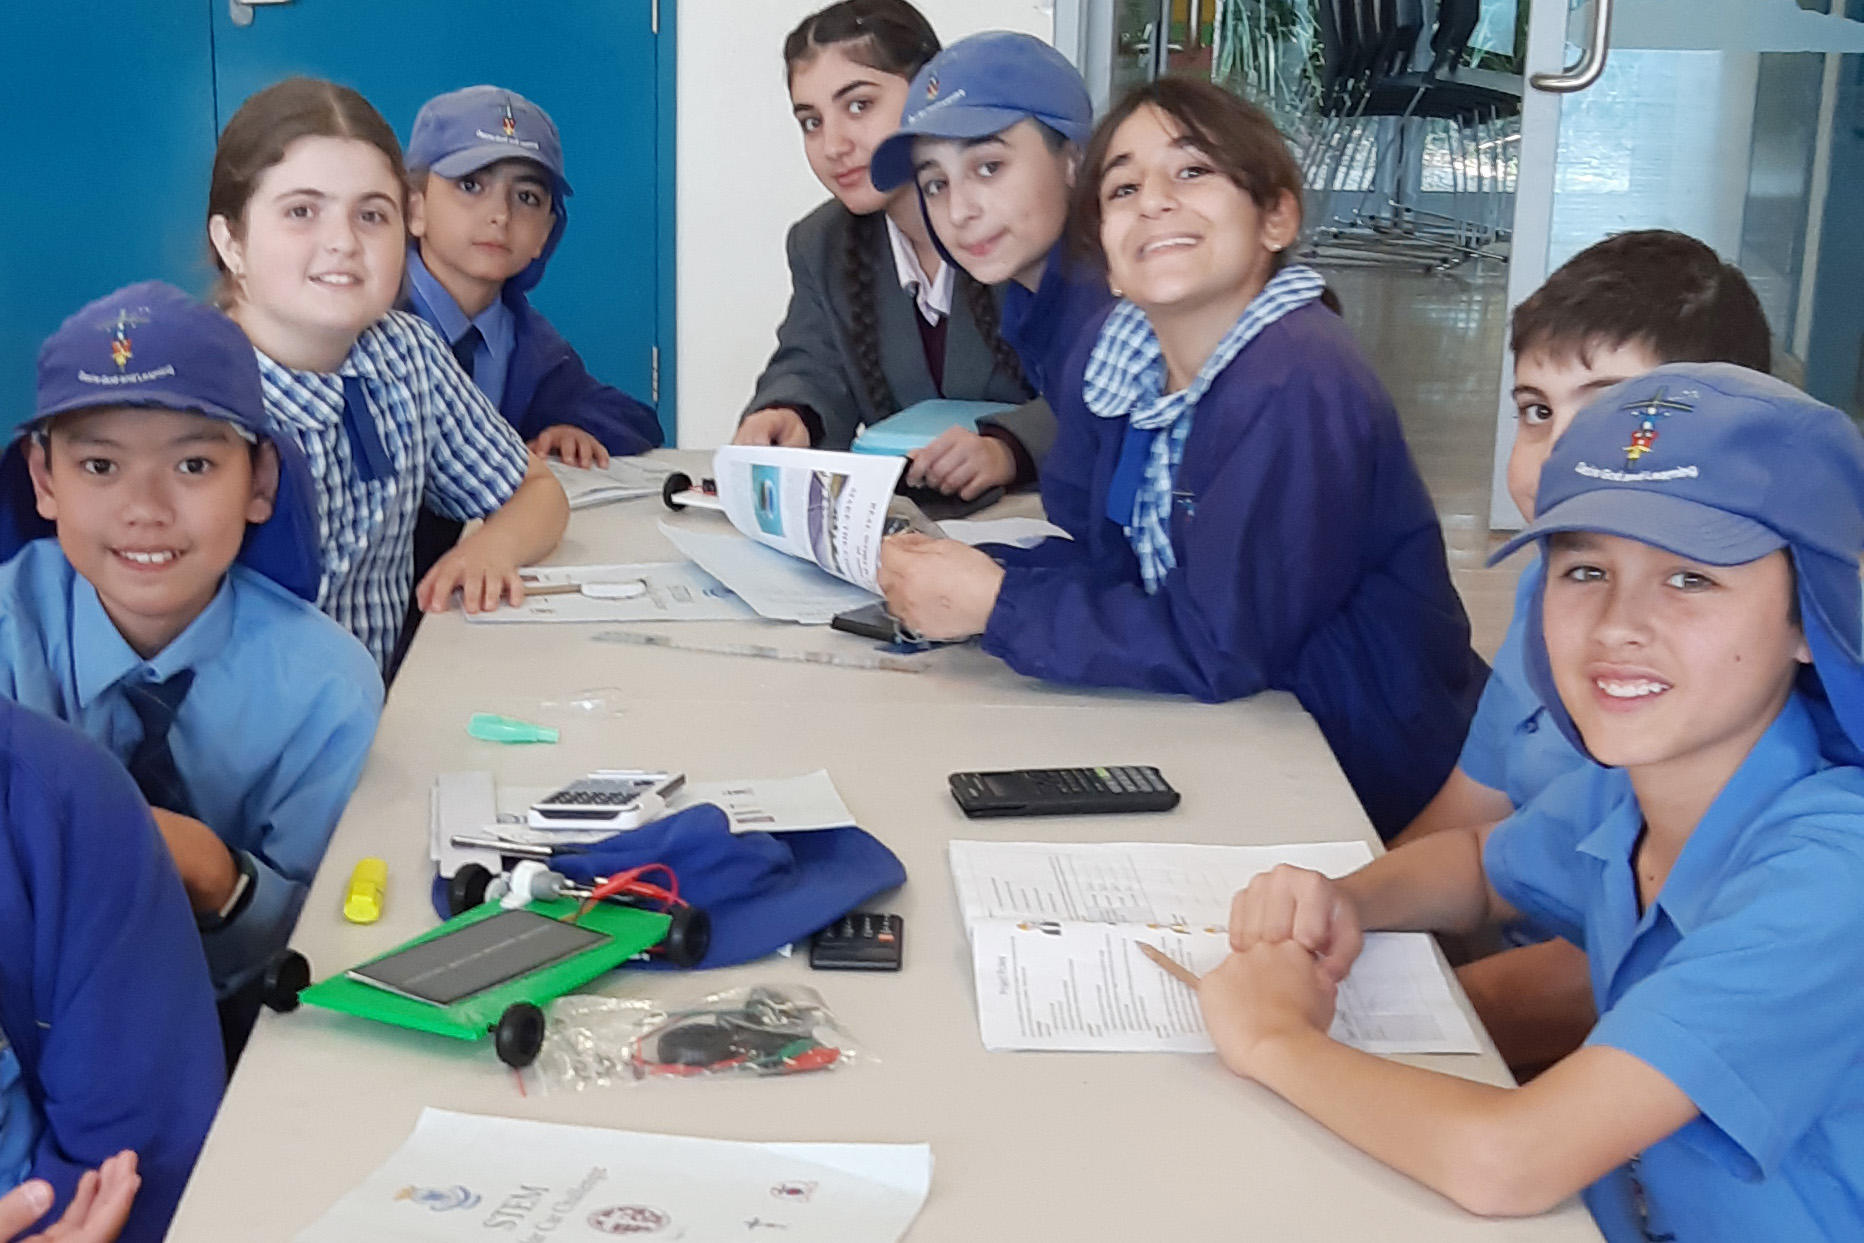 Smiling Sydney Catholic Schools students build solar cars together